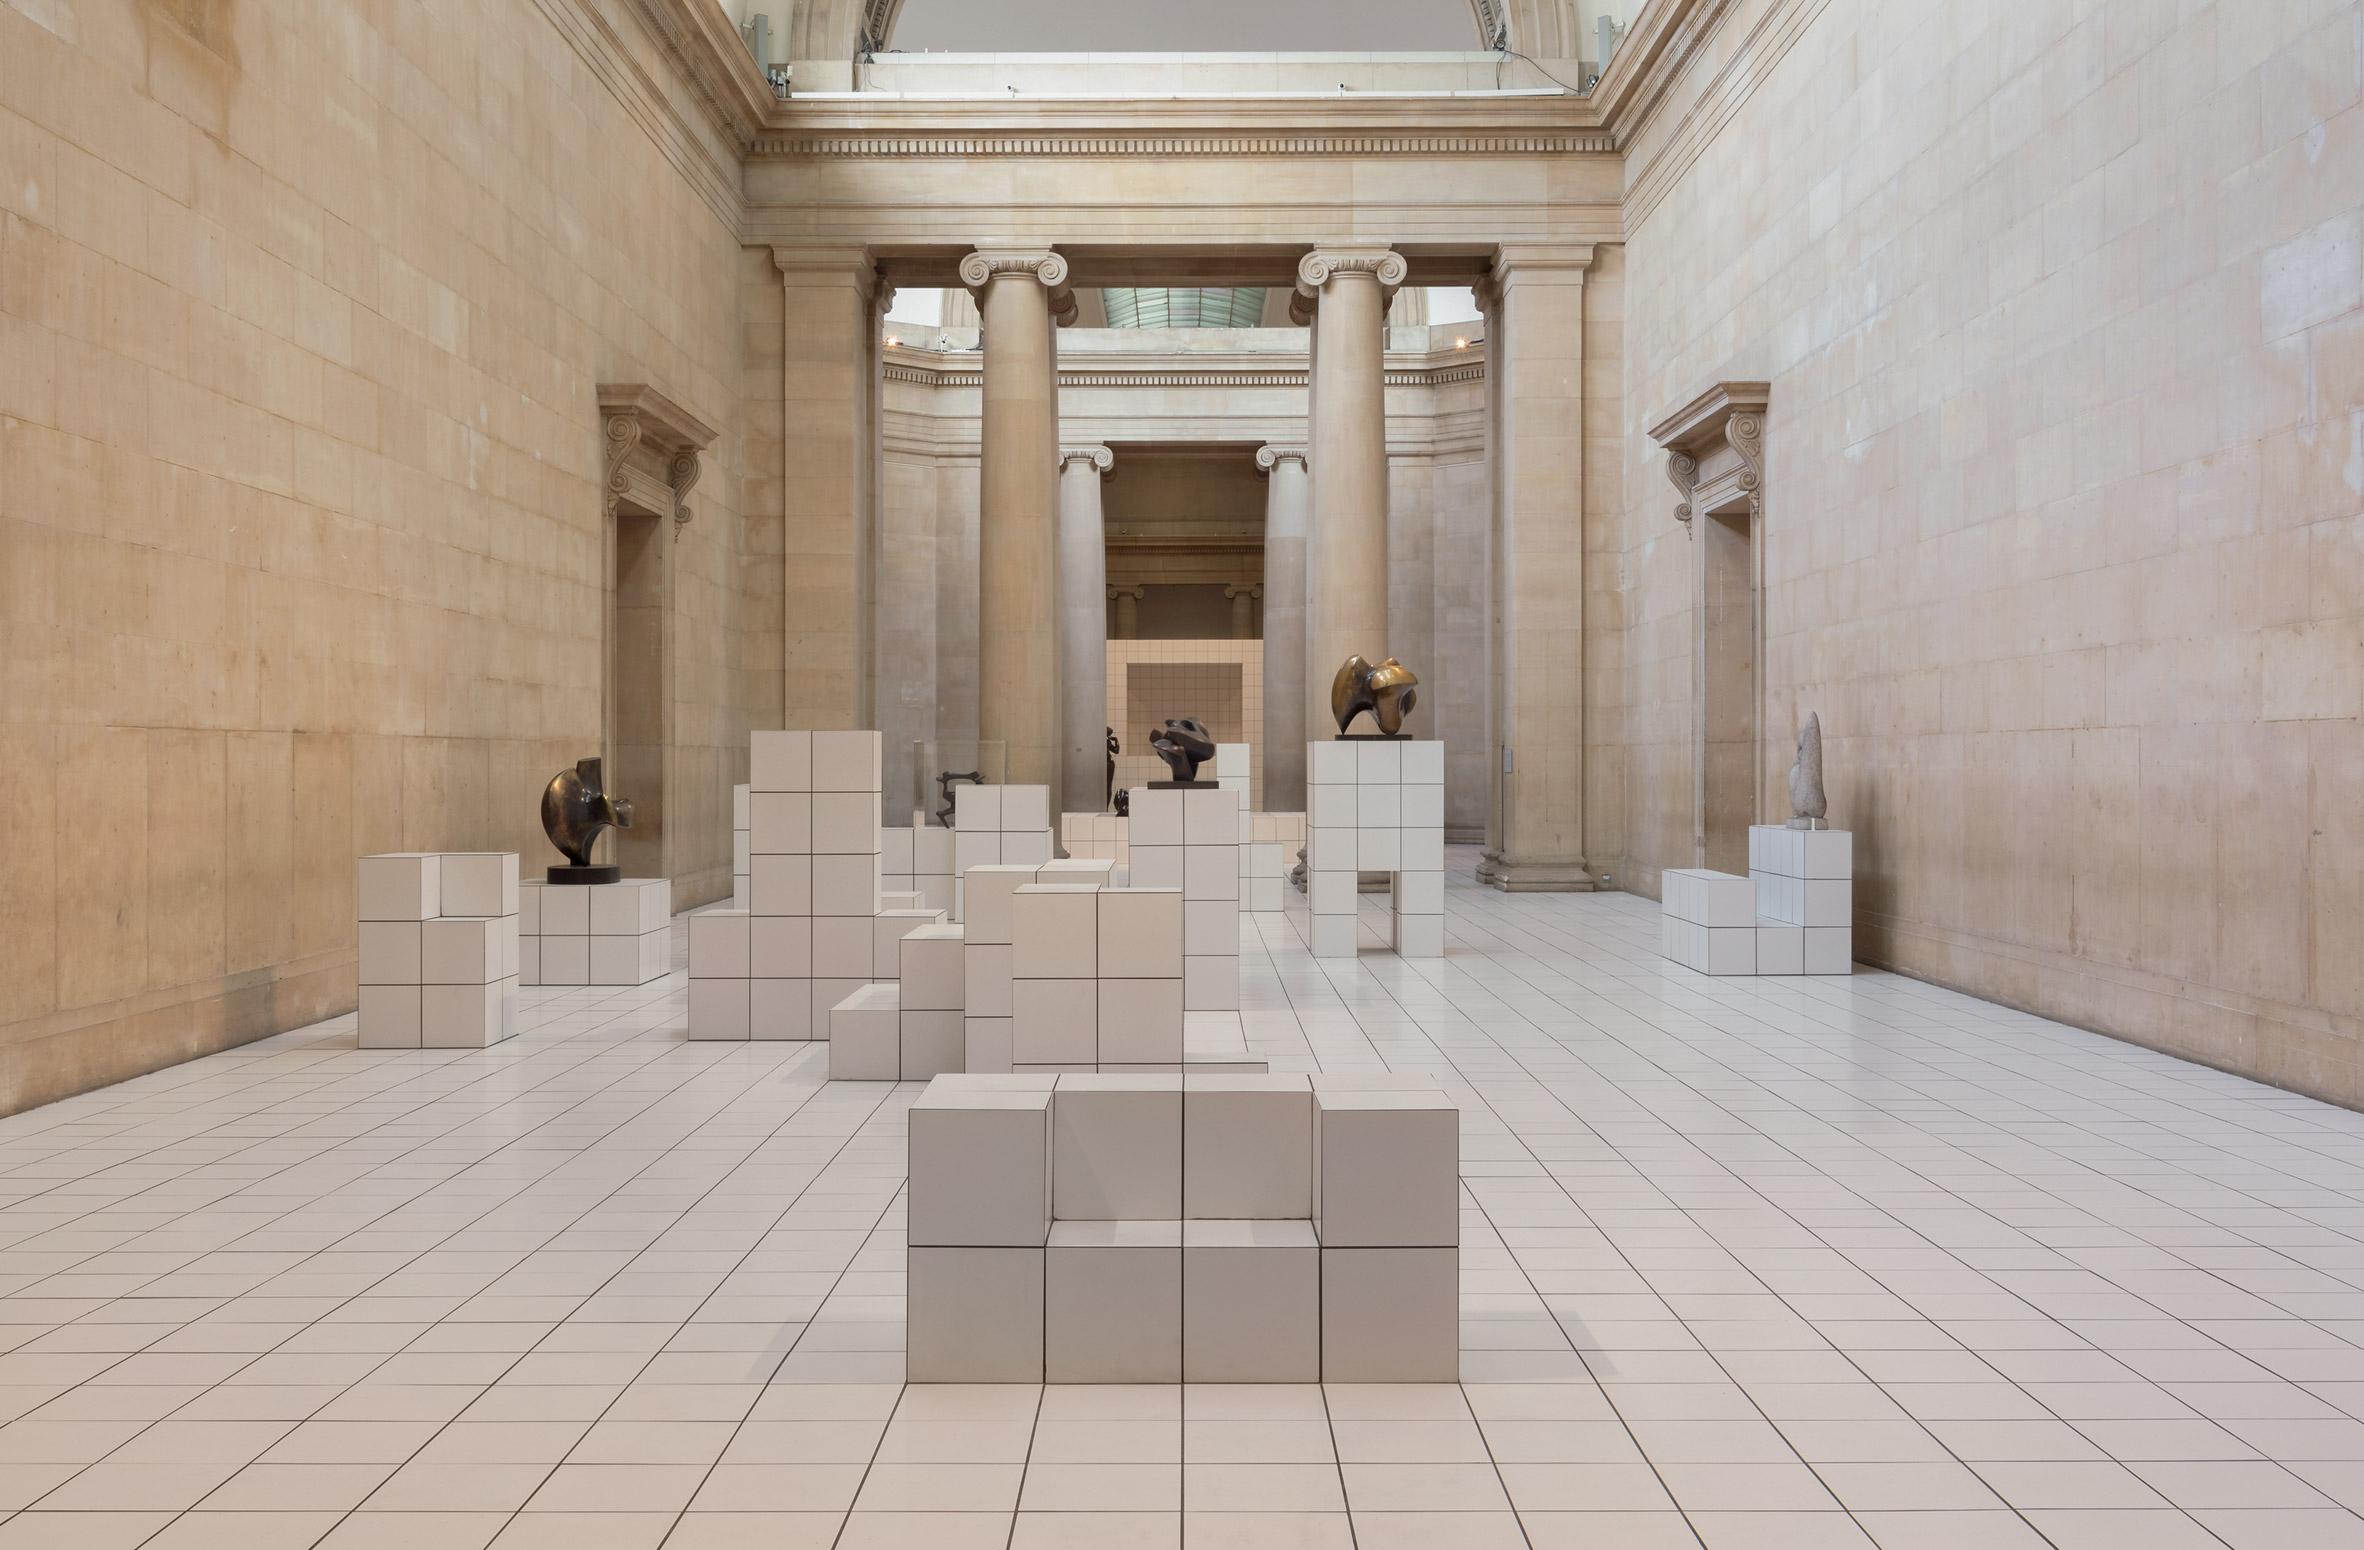 Loewe designs costumes for Anthea Hamilton's Tate Britain installation